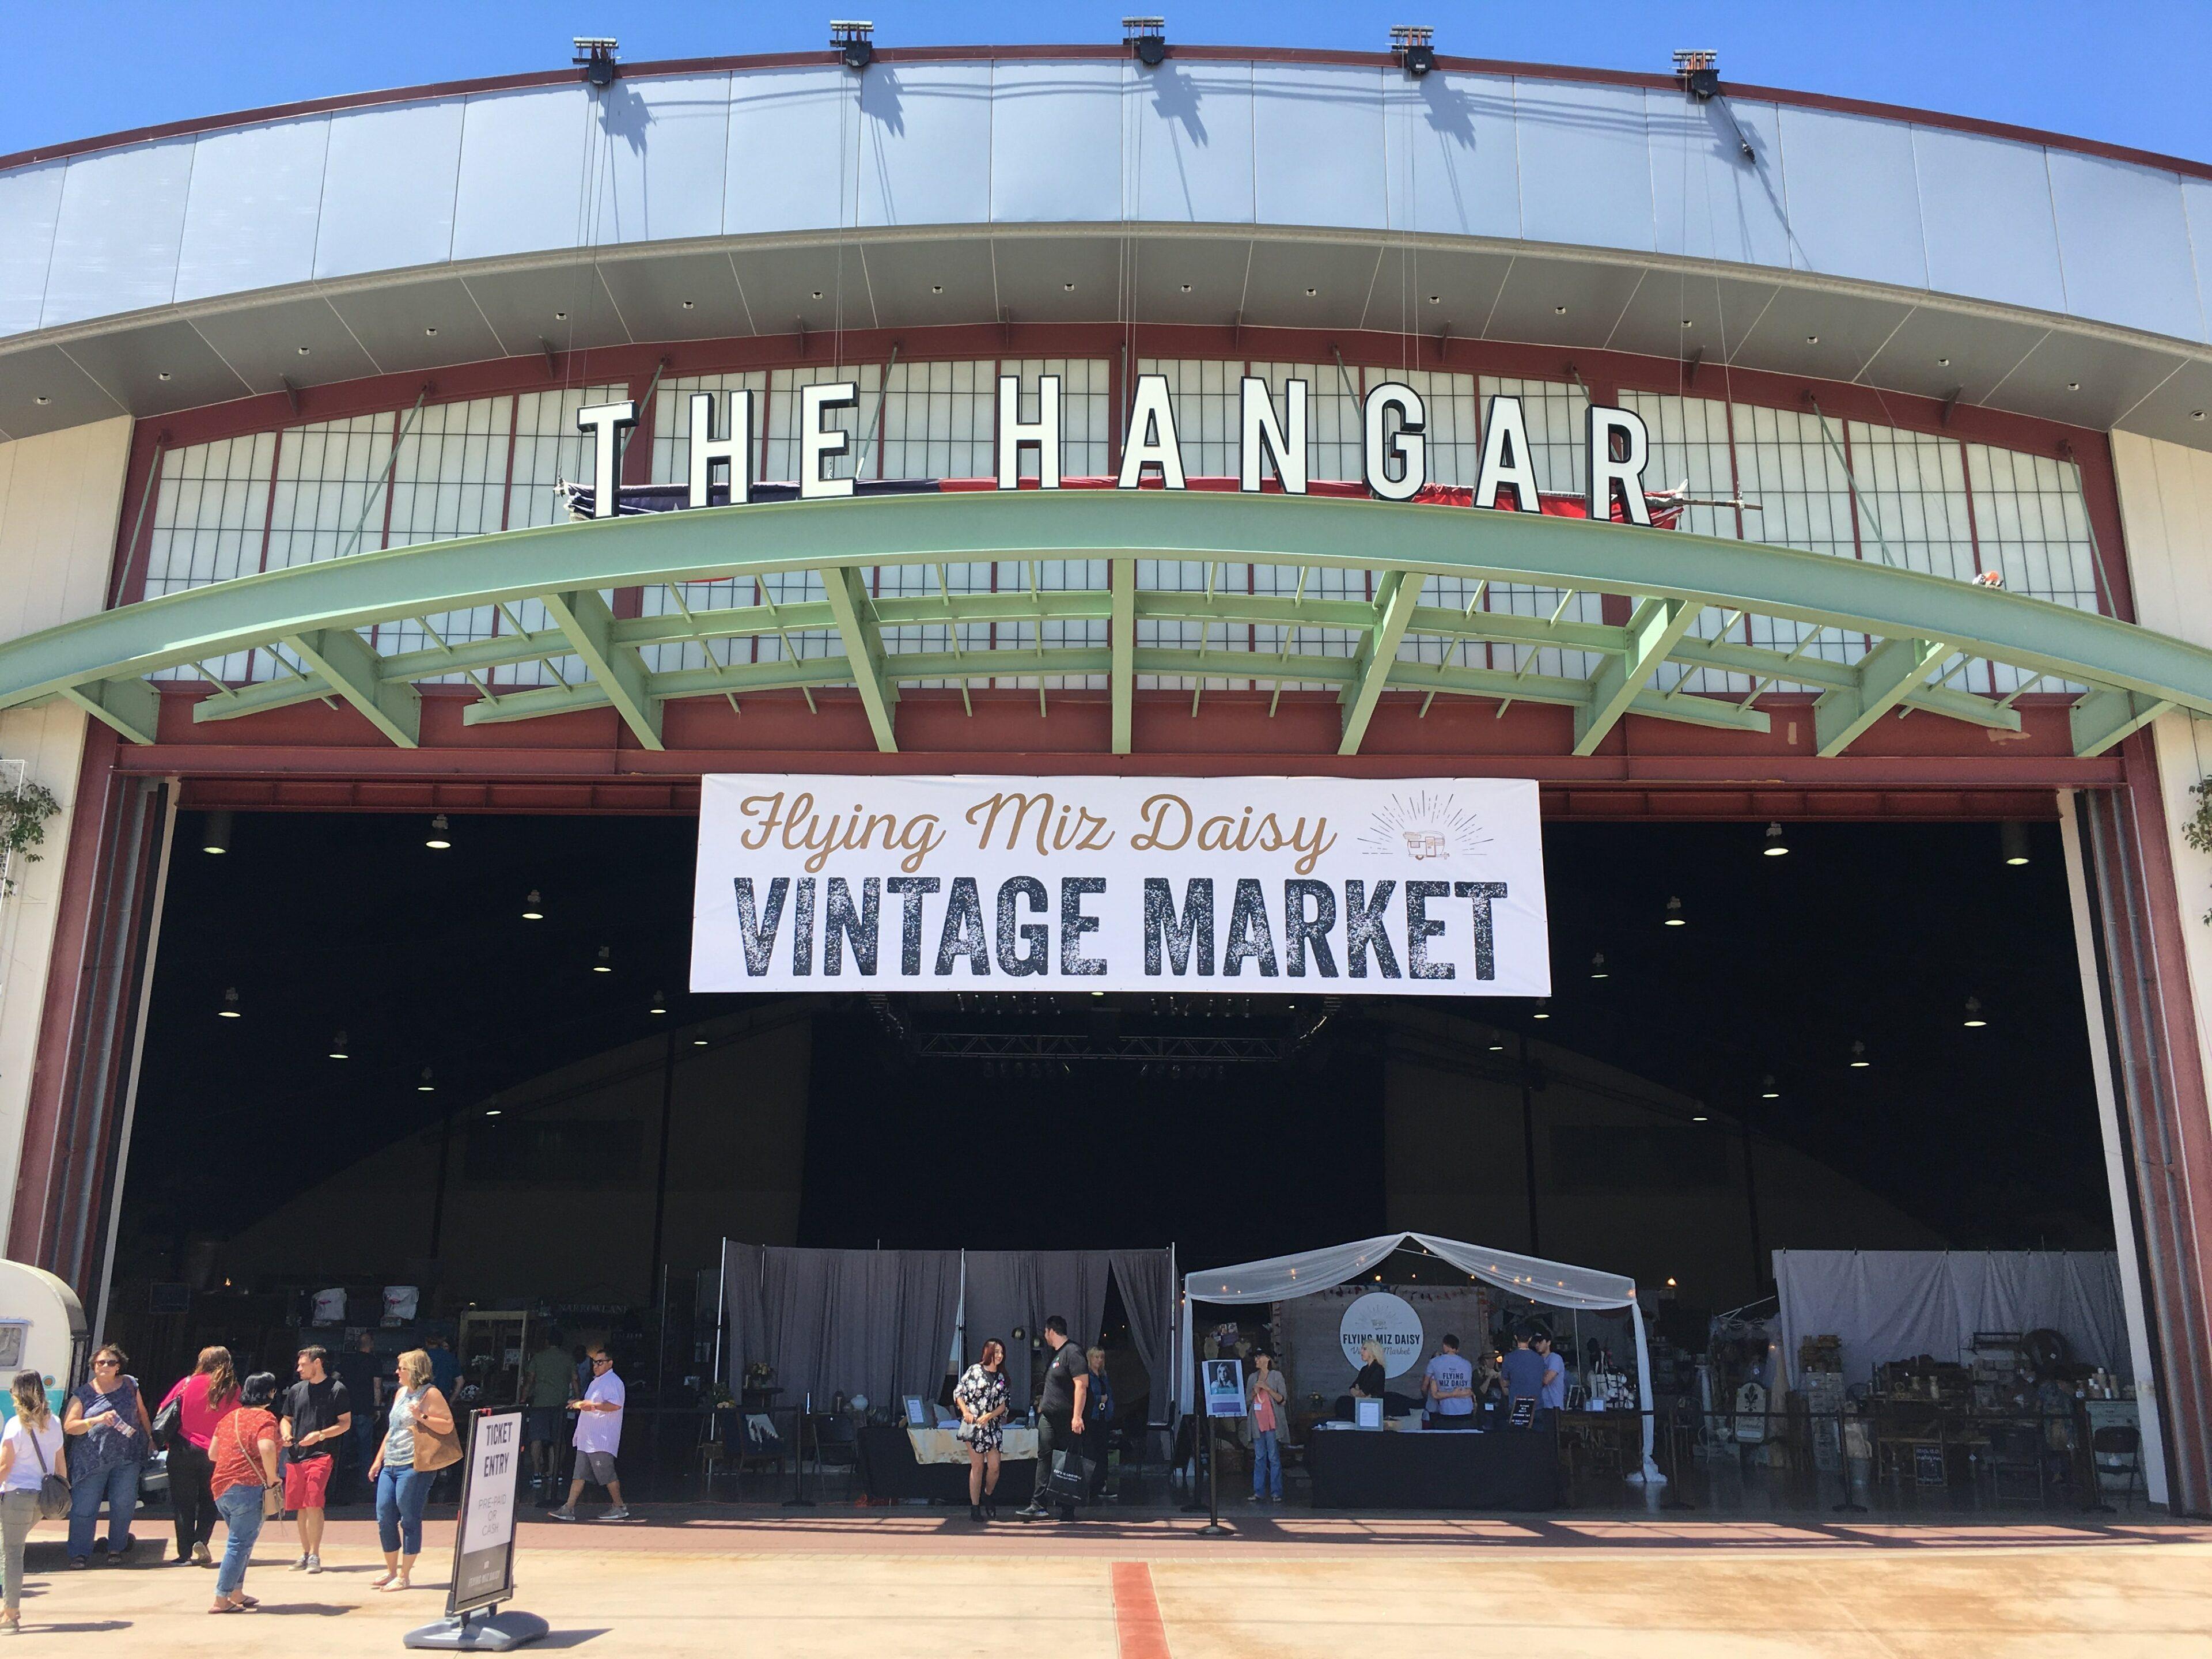 Flying Mrs. Daisy Vintage Market